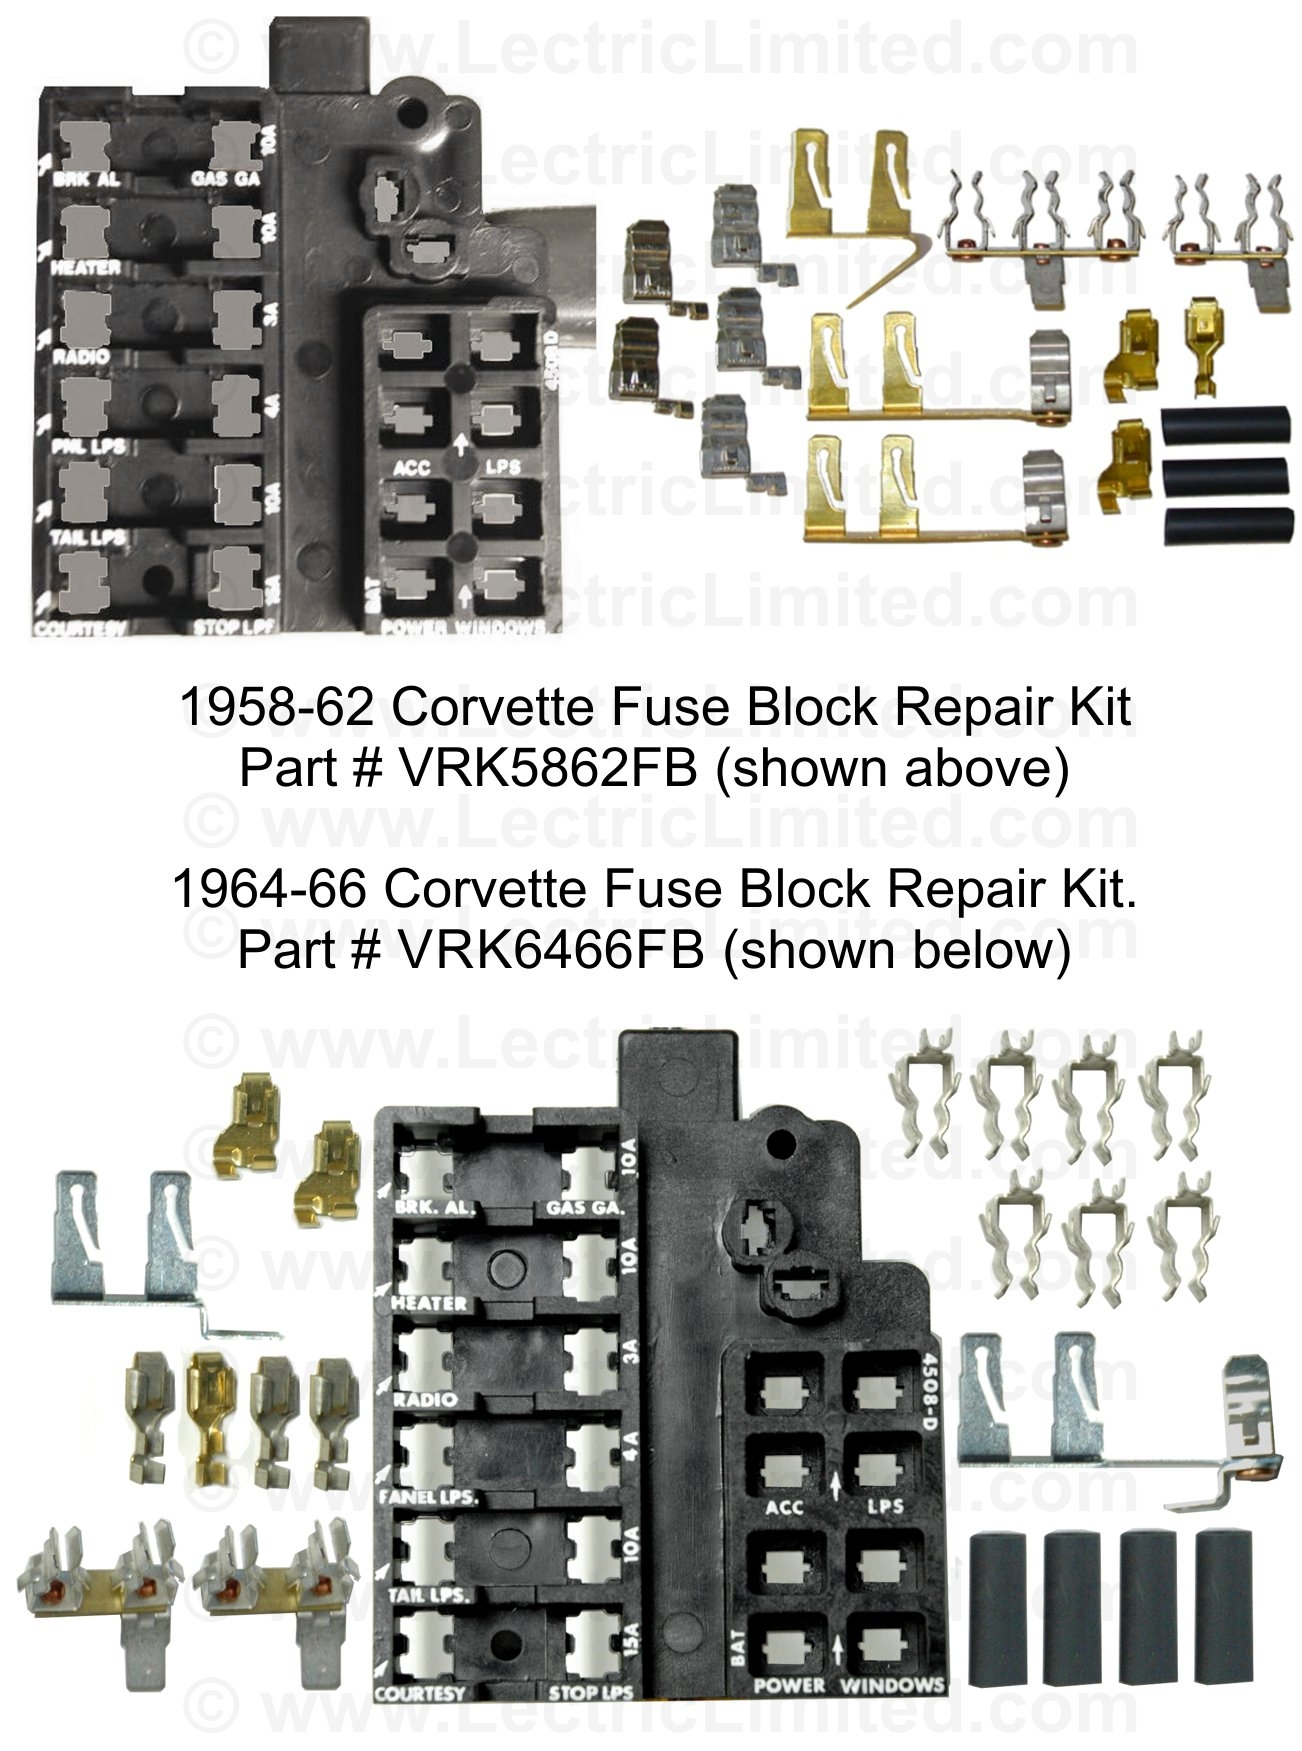 [SCHEMATICS_4LK]  5915A 1966 Impala Fuse Box Diagram | Wiring Diagram | Wiring Library | 1966 Corvette Fuse Box Diagram |  | Wiring Library